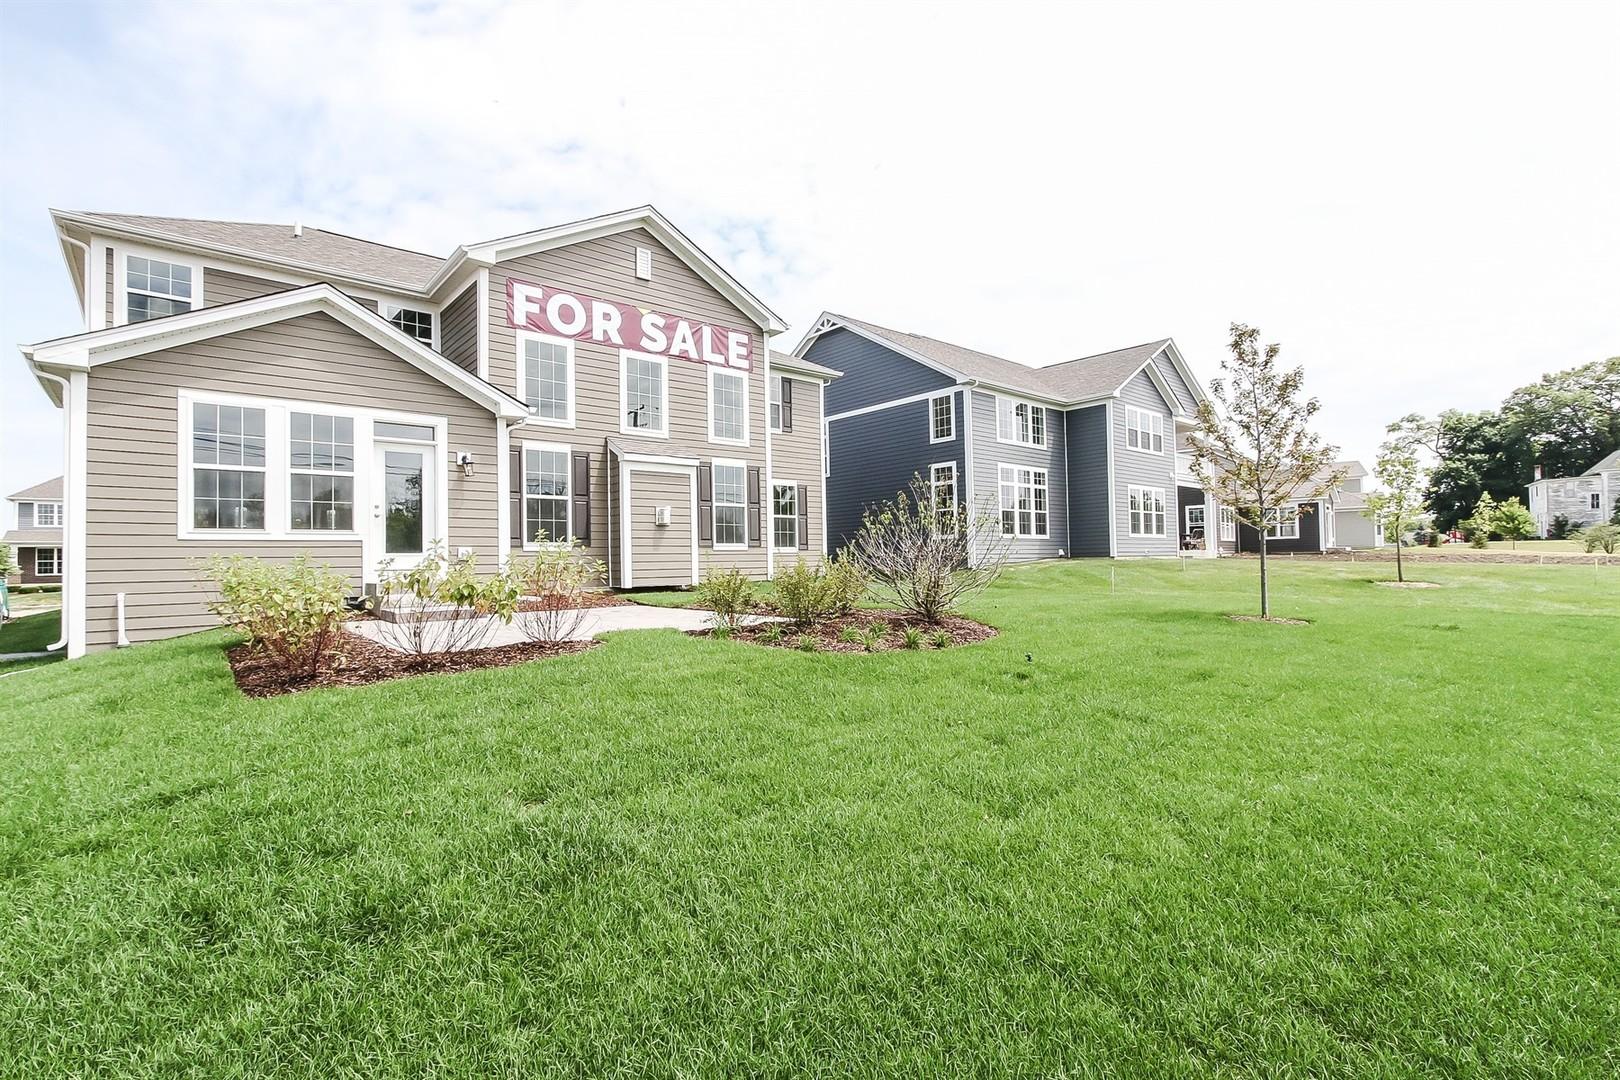 3415 Elsie Lot# 39, HOFFMAN ESTATES, Illinois, 60192